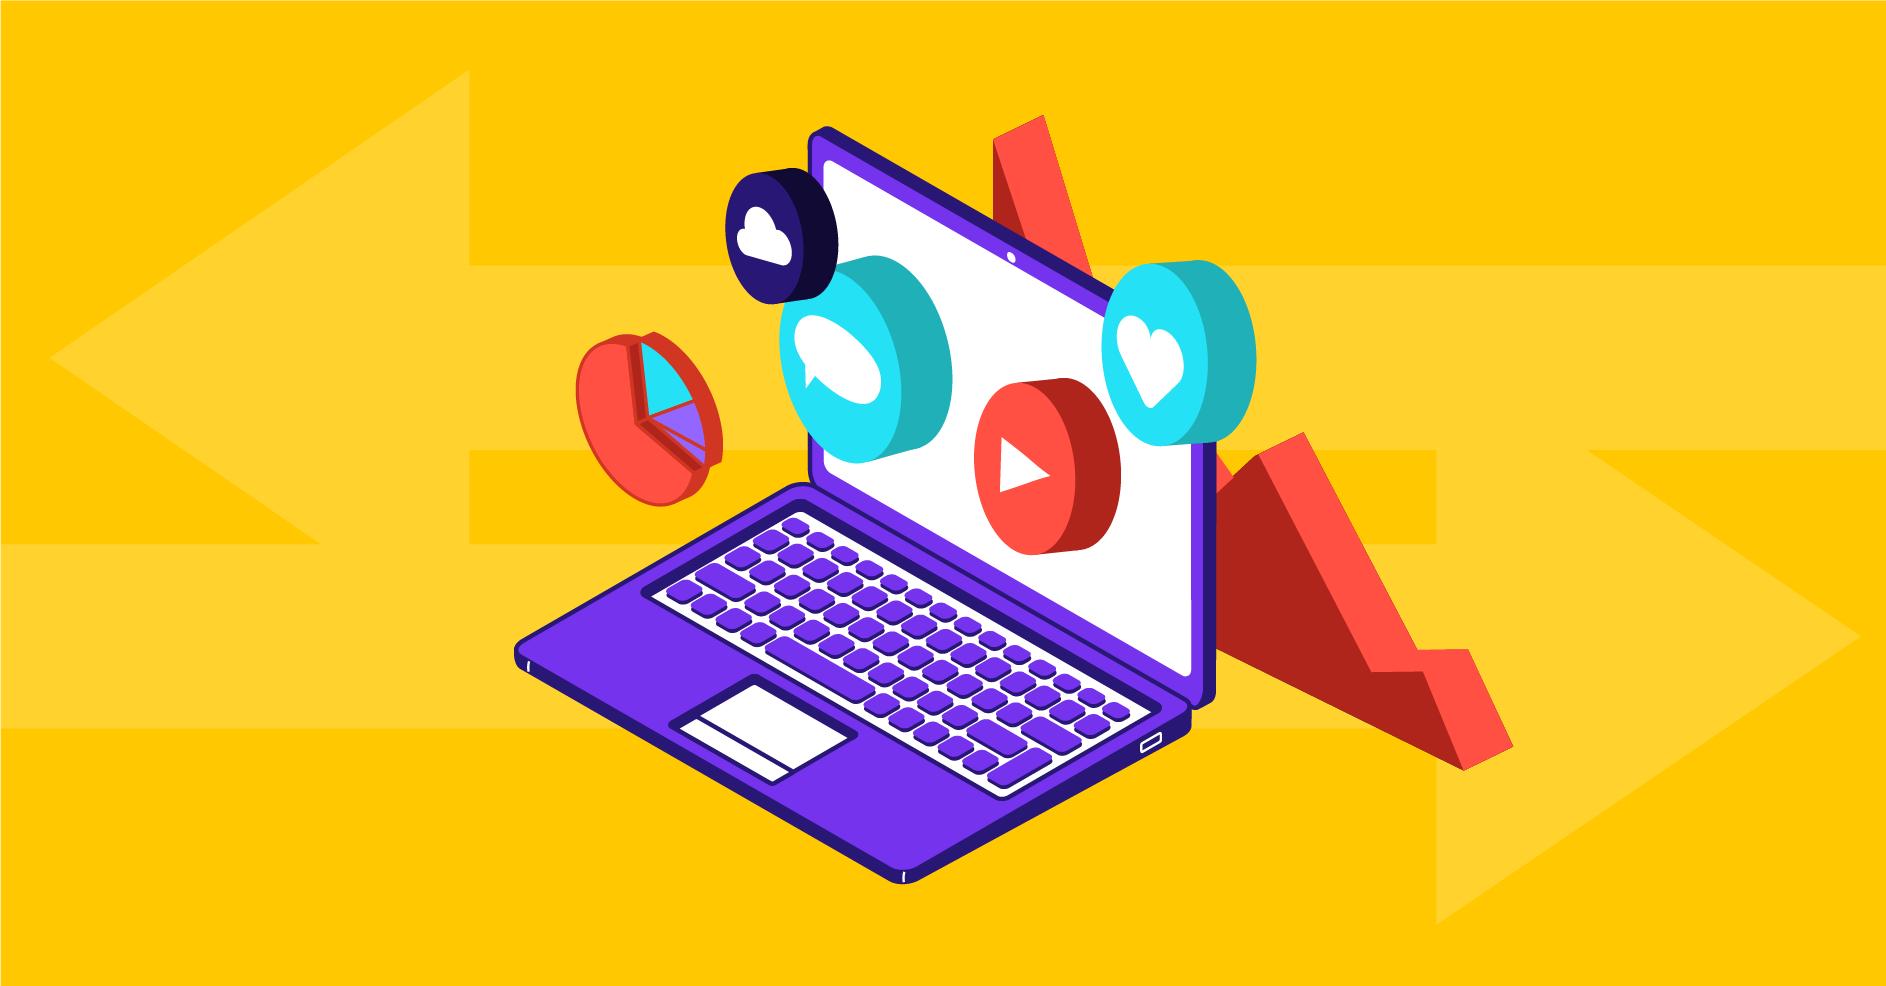 https://spotme.com/wp-content/uploads/2021/03/Hero-Transform-Your-Random-Webinars-into-a-Lead-Generation-System.png